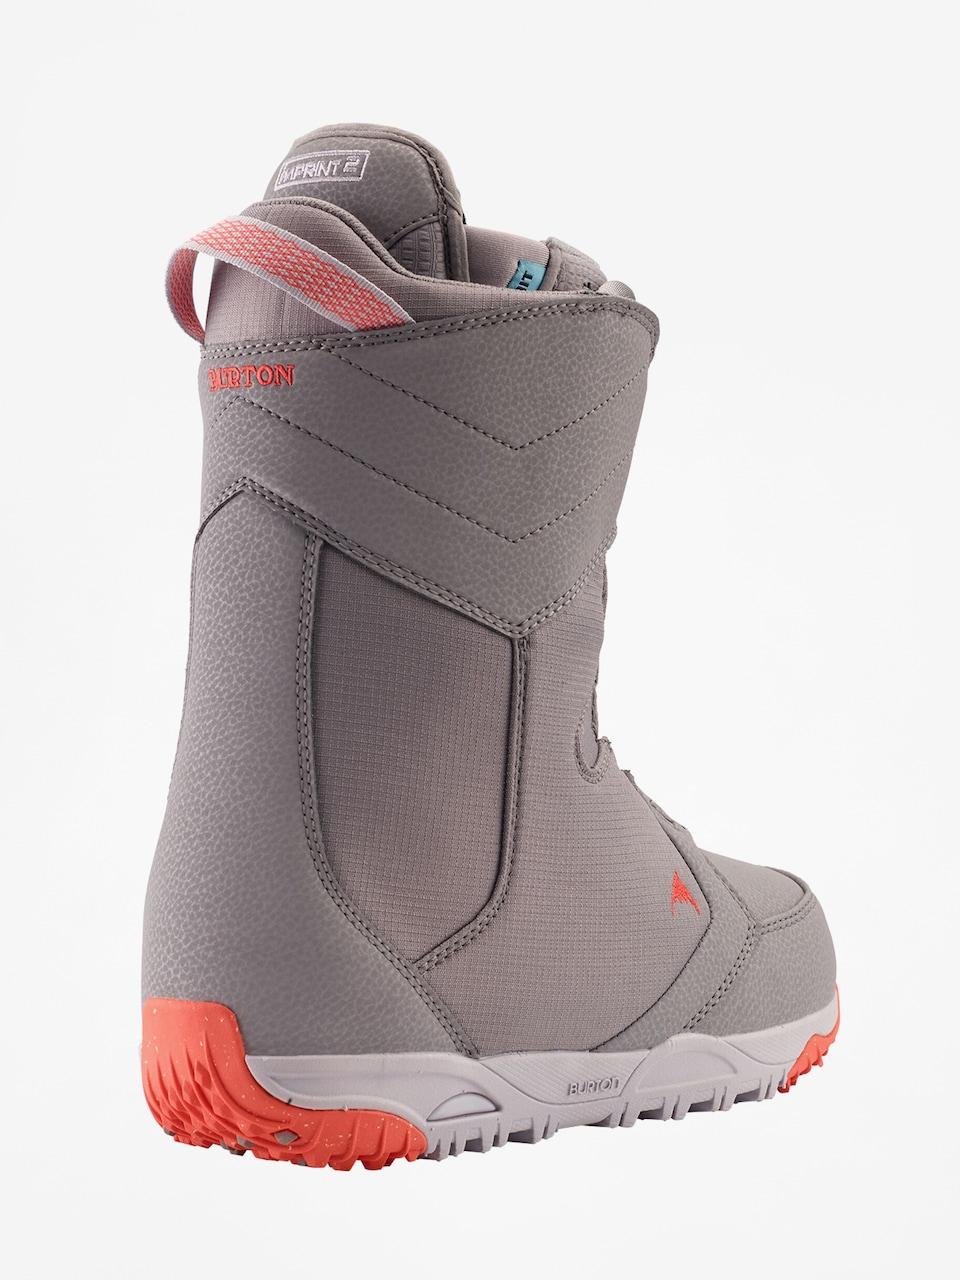 Burton Limelight BOA Snowboard Boots Womens